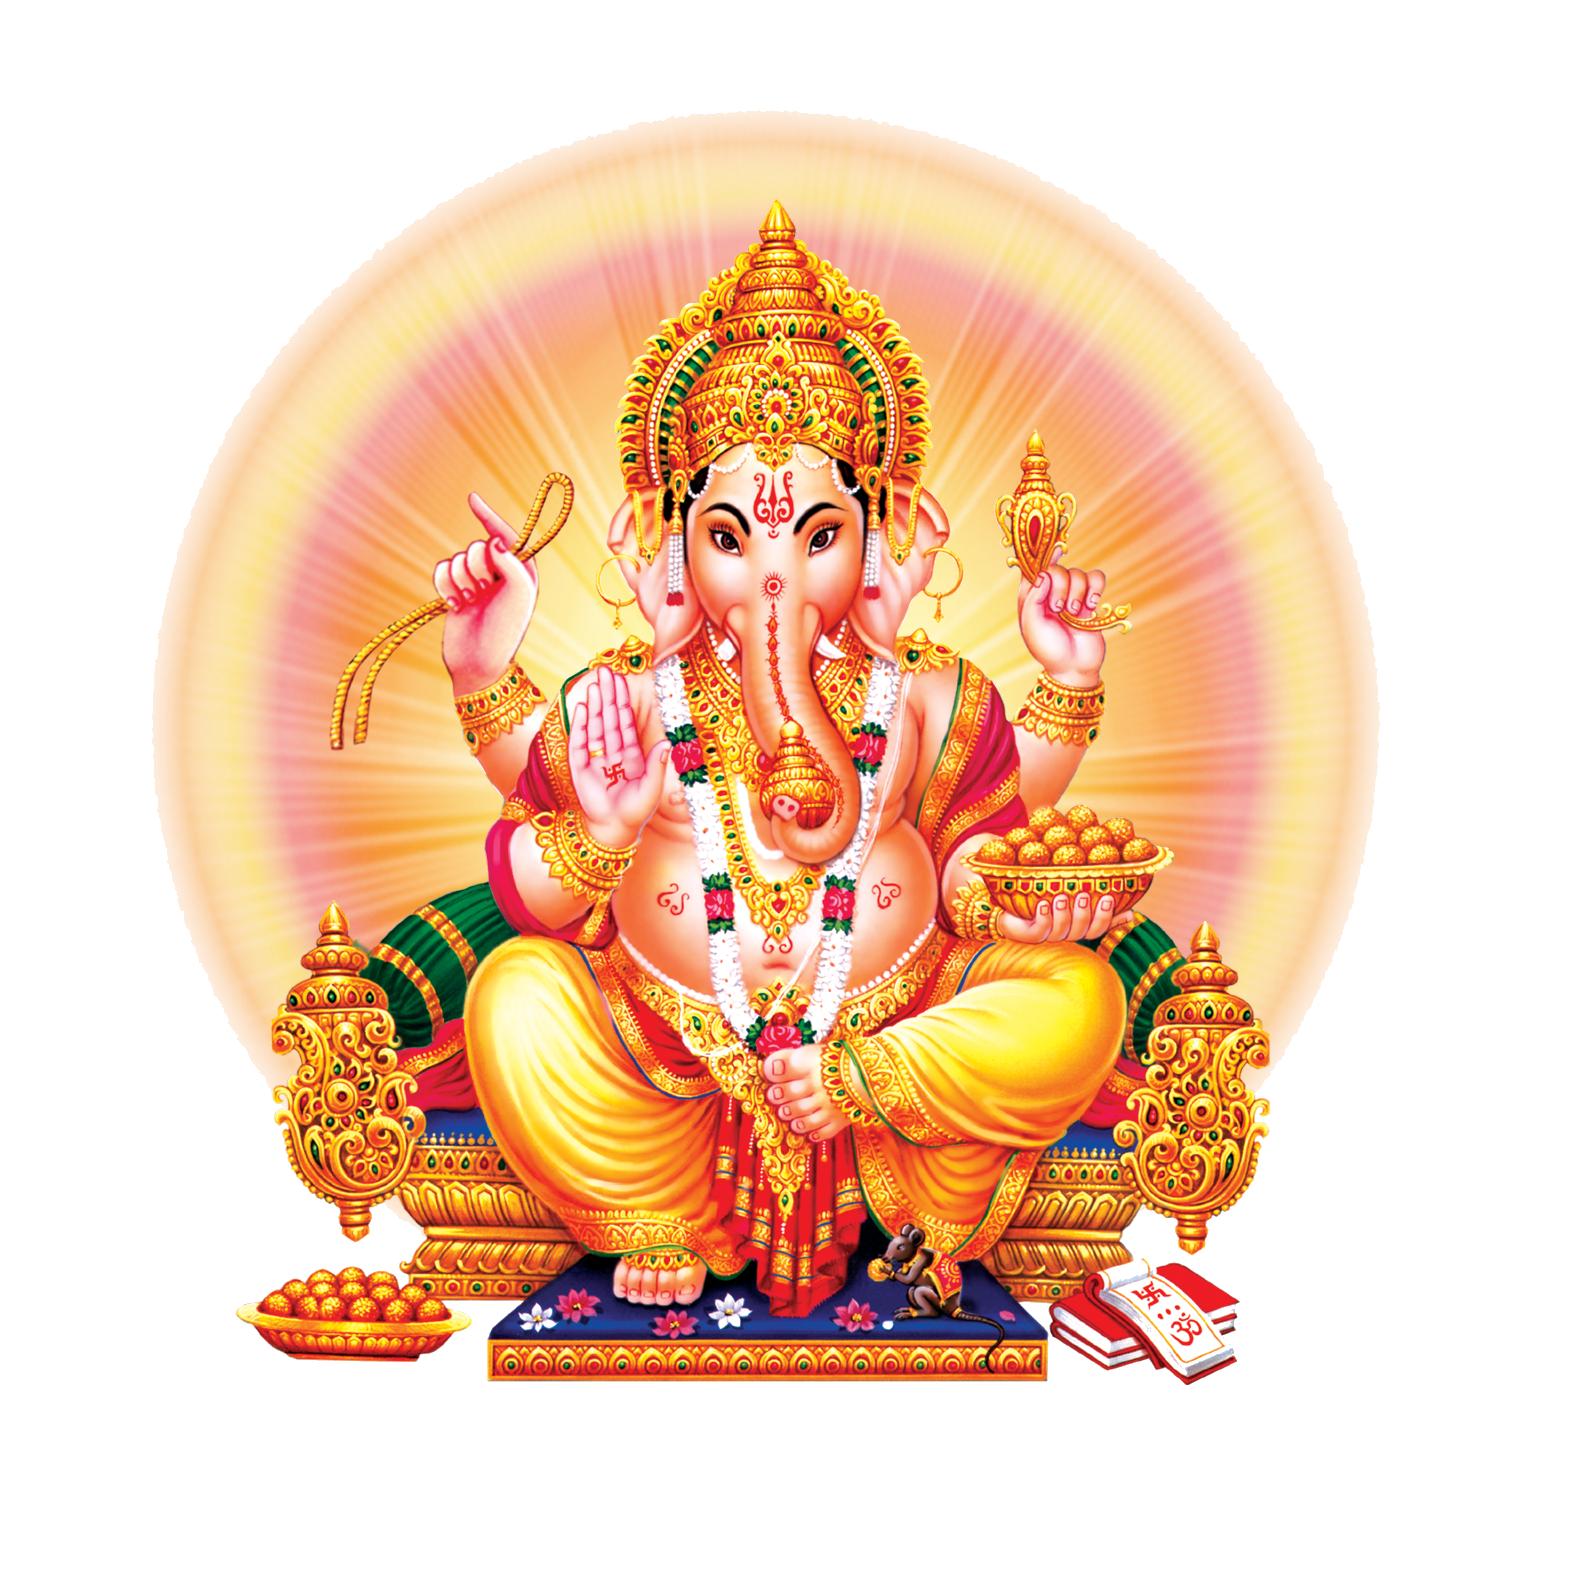 Sri Ganesh Png - Download Sri Ganesh Png Images Transparent Gallery. Advertisement, Transparent background PNG HD thumbnail